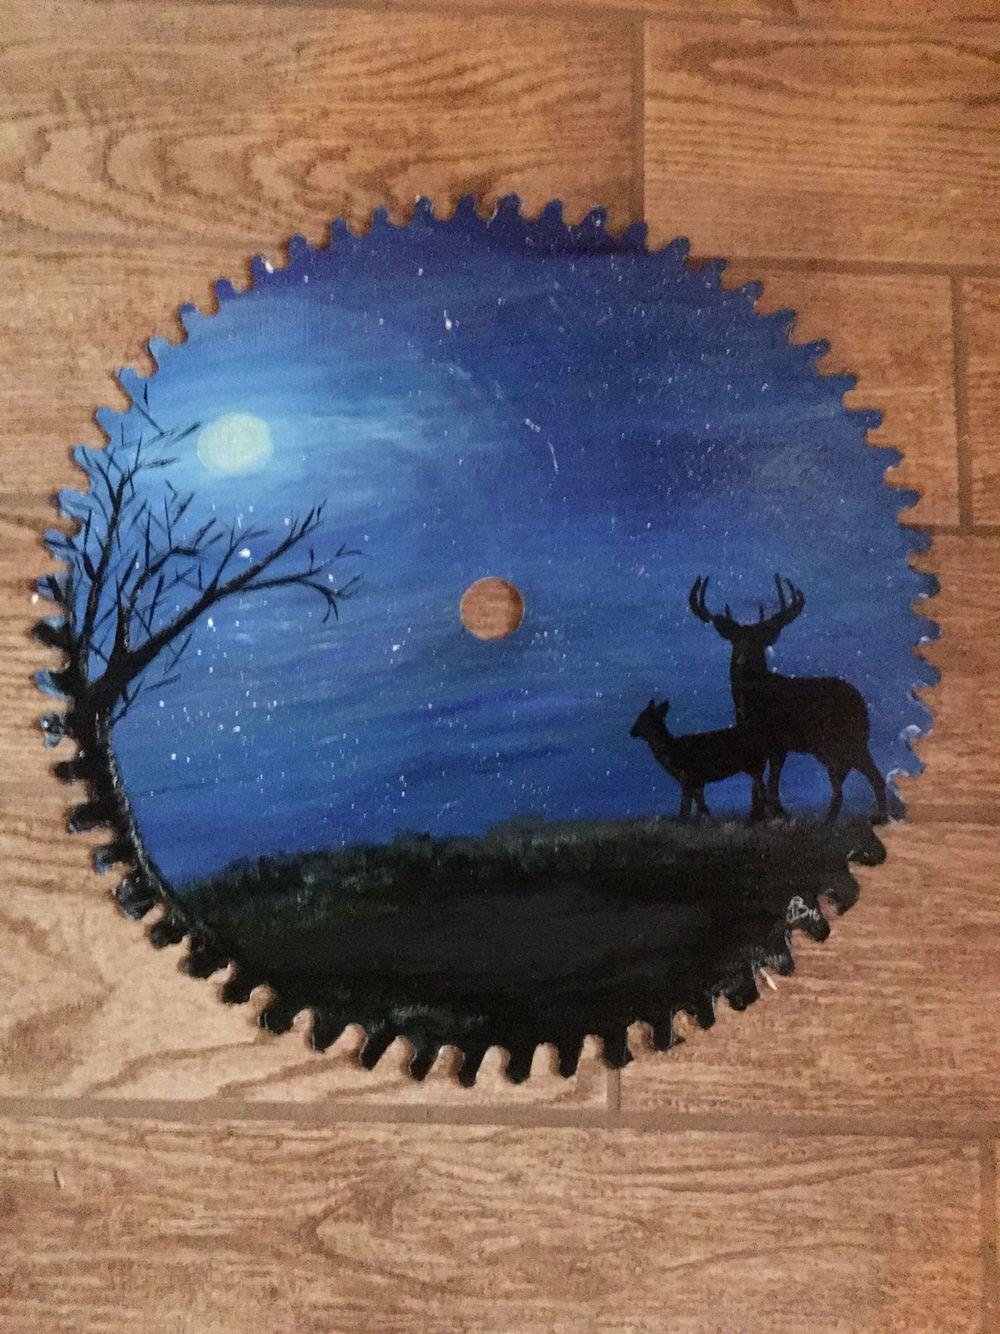 Painted Saw Blade Painting Crafts Circular Saw Circular Saw Blades